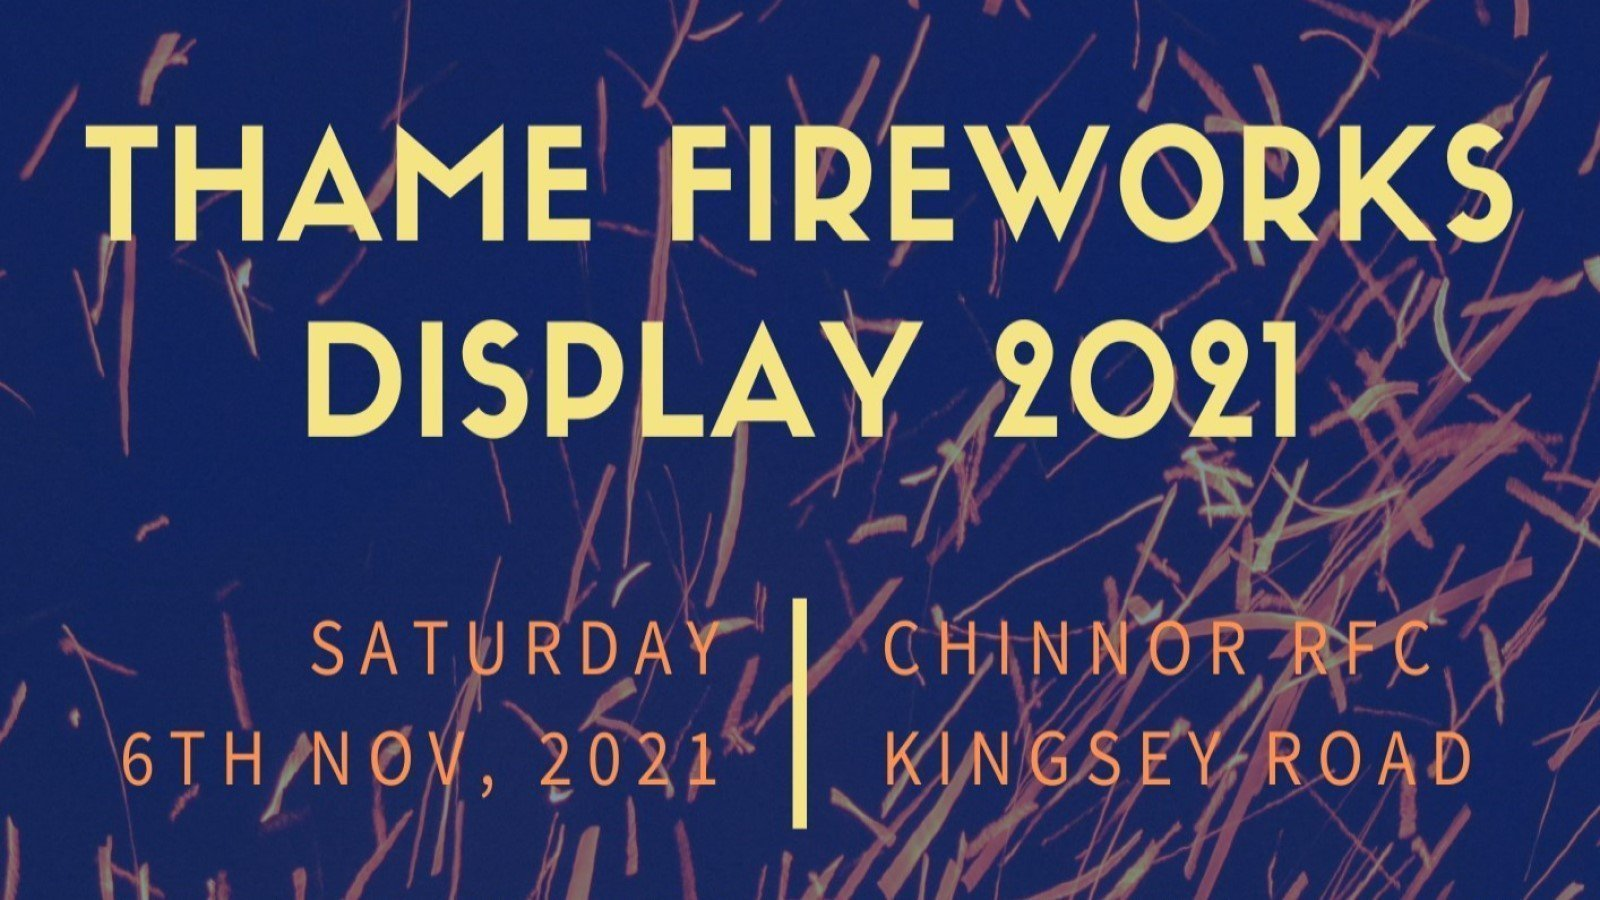 Thame Fireworks Display 2021